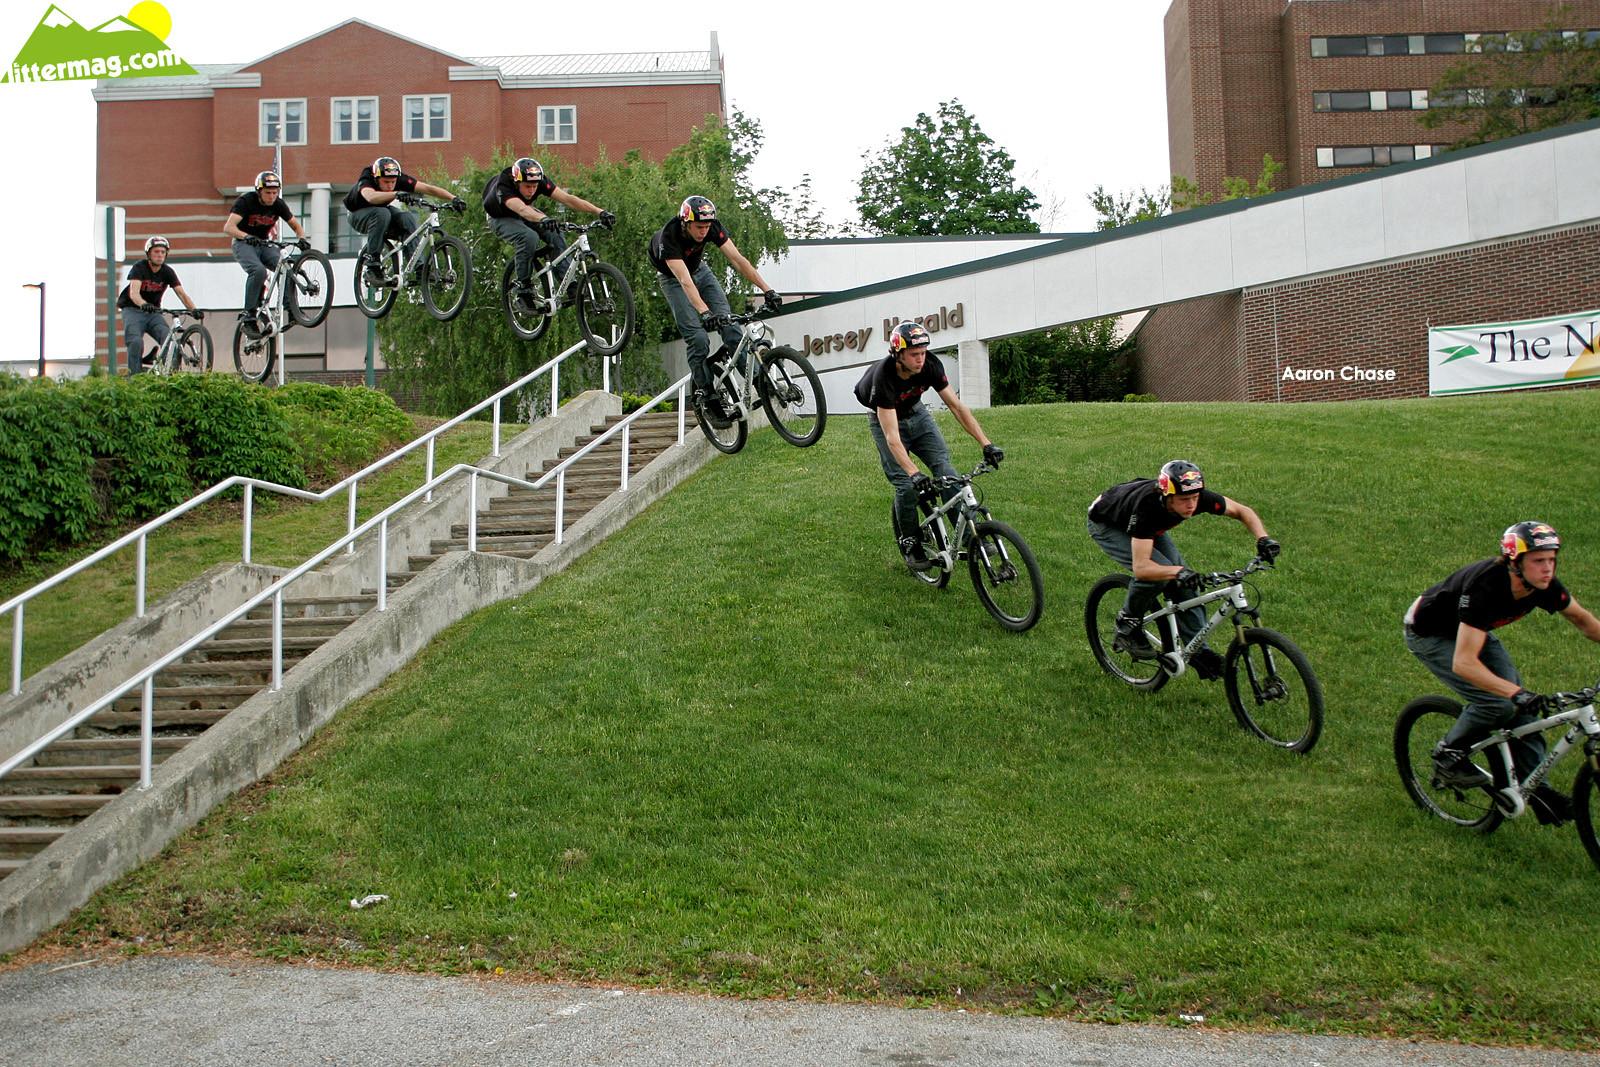 Aaron Chase, Rail Hop - Freeride Wallpapers - Mountain Biking Pictures - Vital MTB